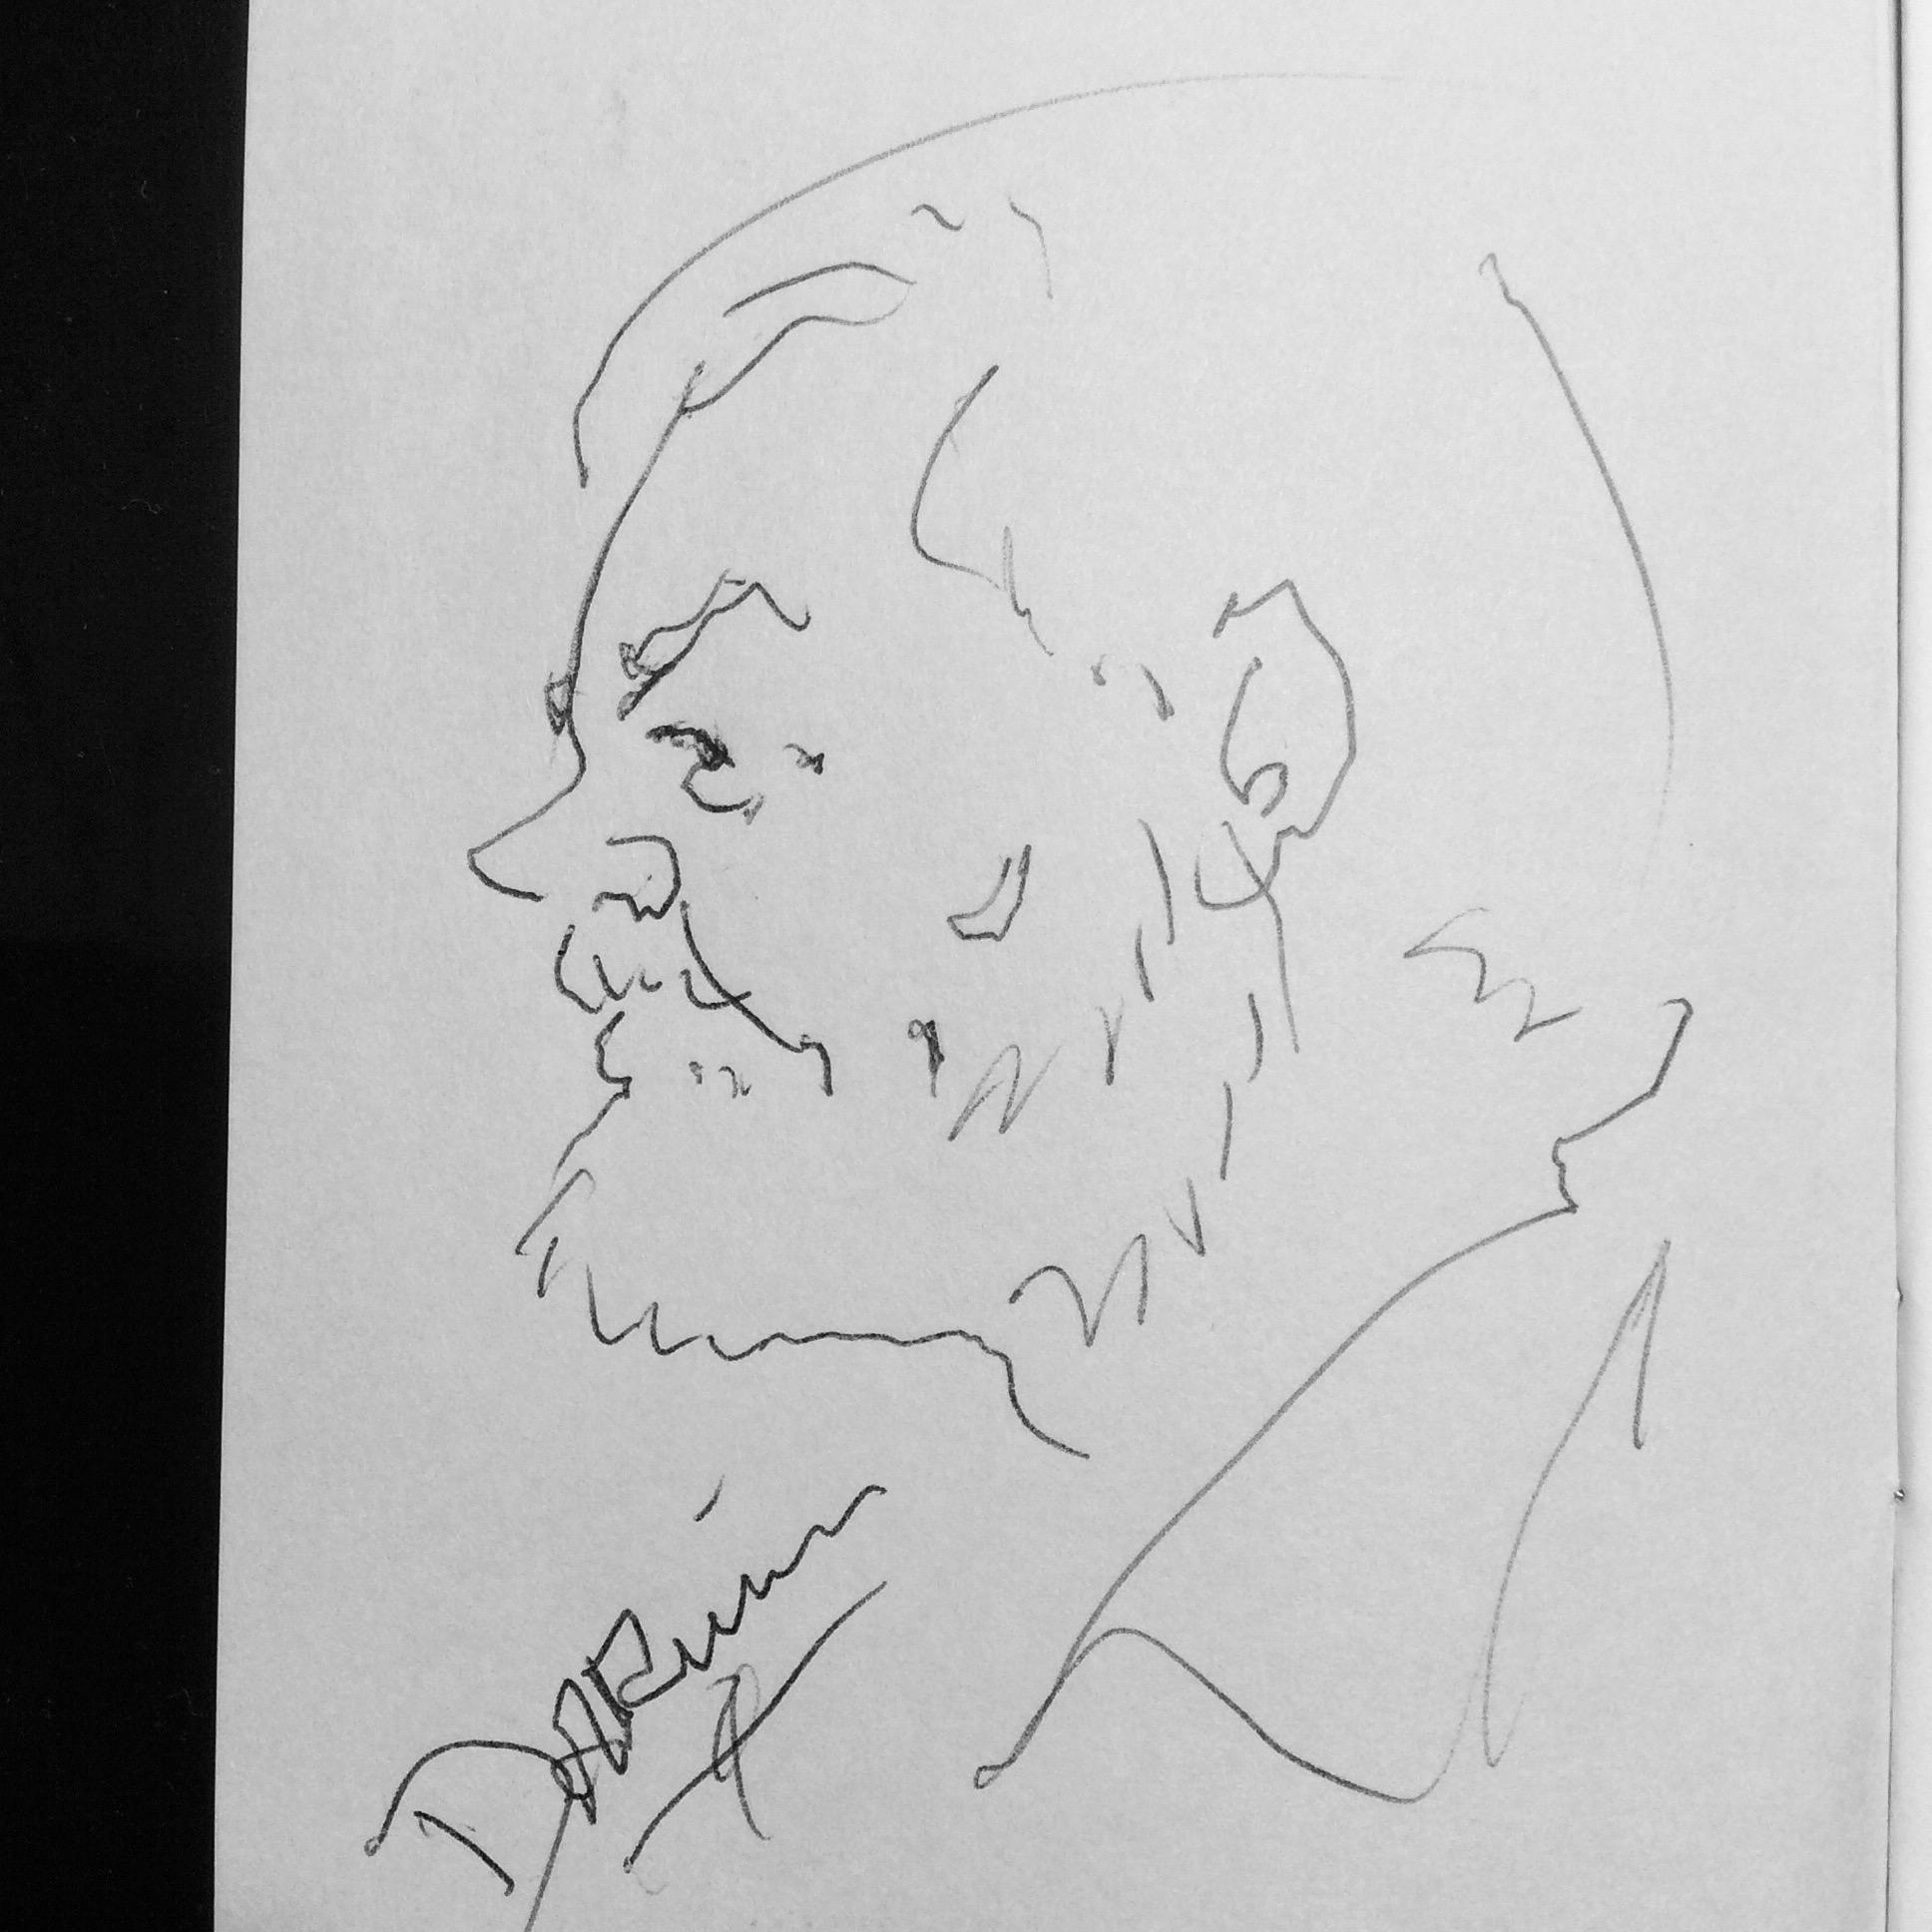 Gary Darwin's 60 second drawing of Scott Wells